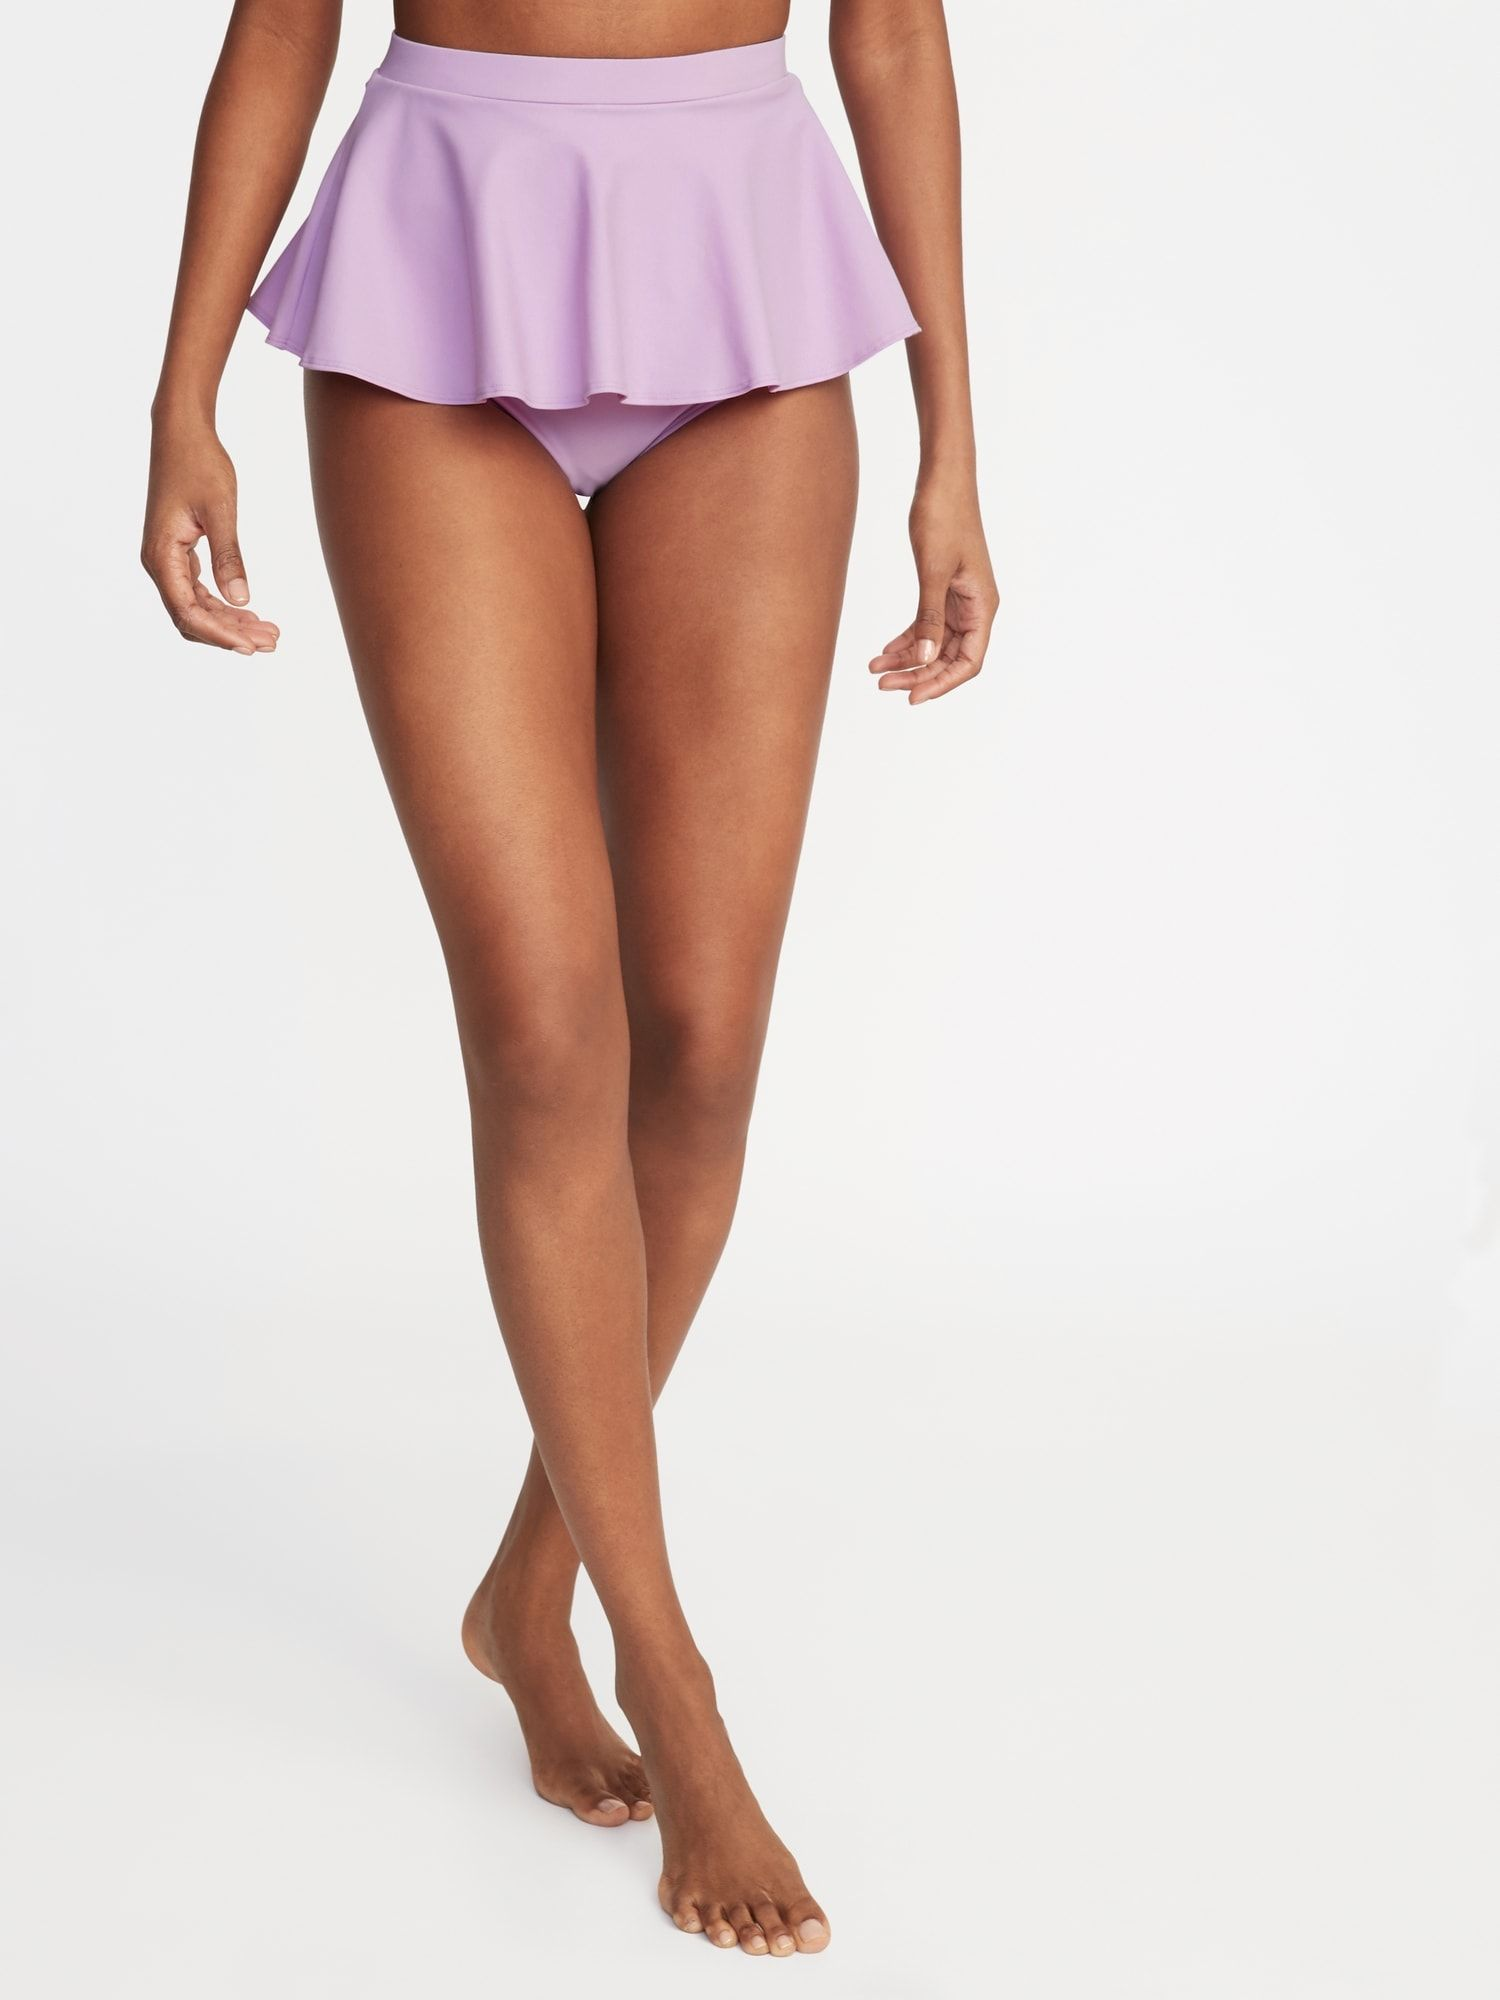 959ce17fea3c3 High-Rise Peplum-Hem Swim Bottoms for Women | Old Navy Peplum Swimsuit,